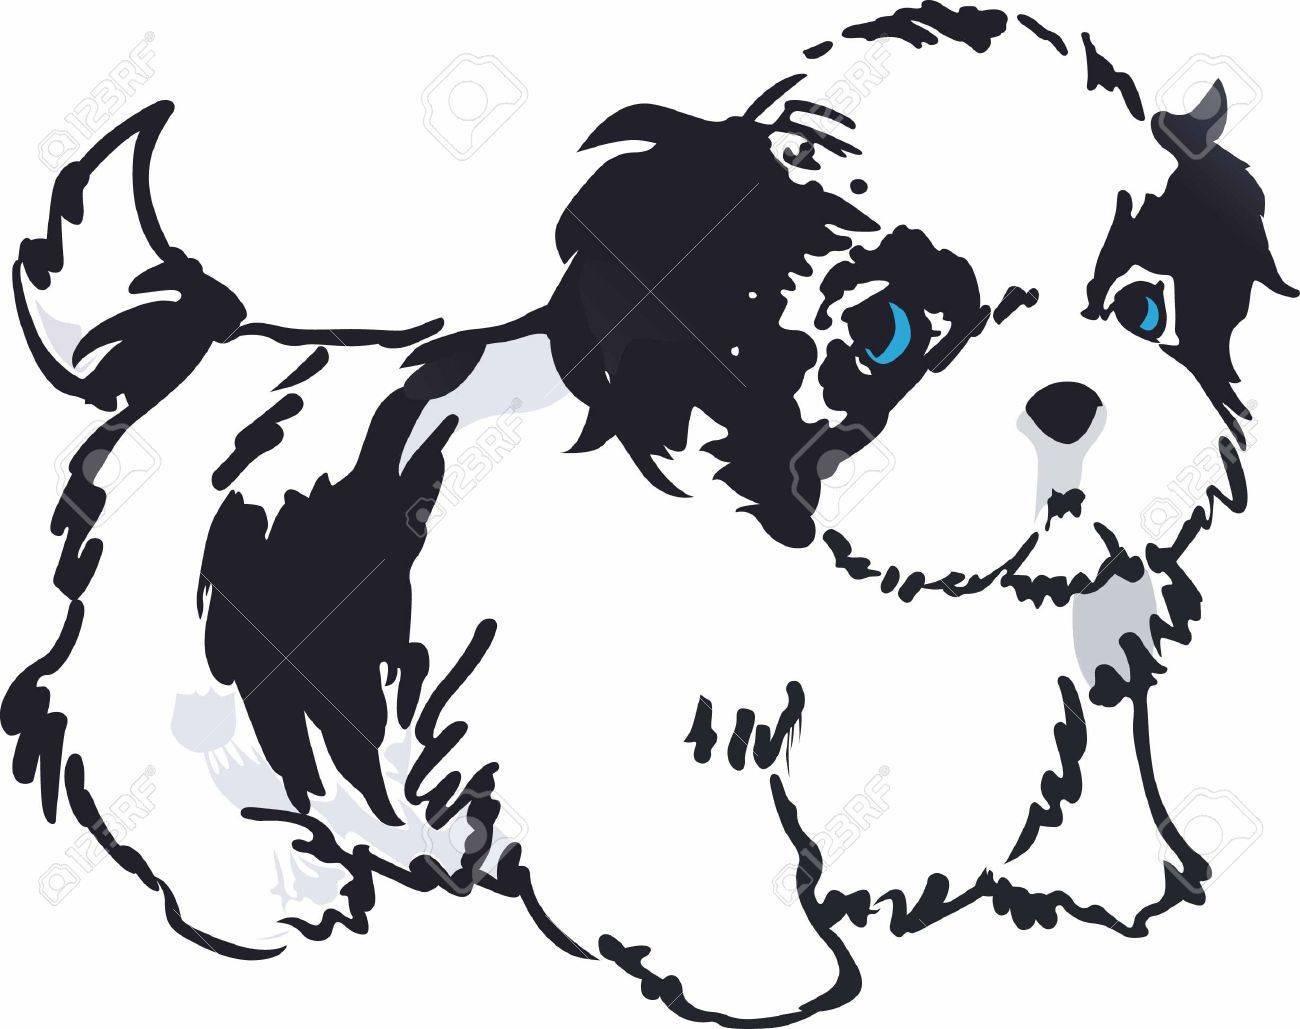 Shih tzu puppies clipart banner free Shih tzu clipart black and white 3 » Clipart Portal banner free